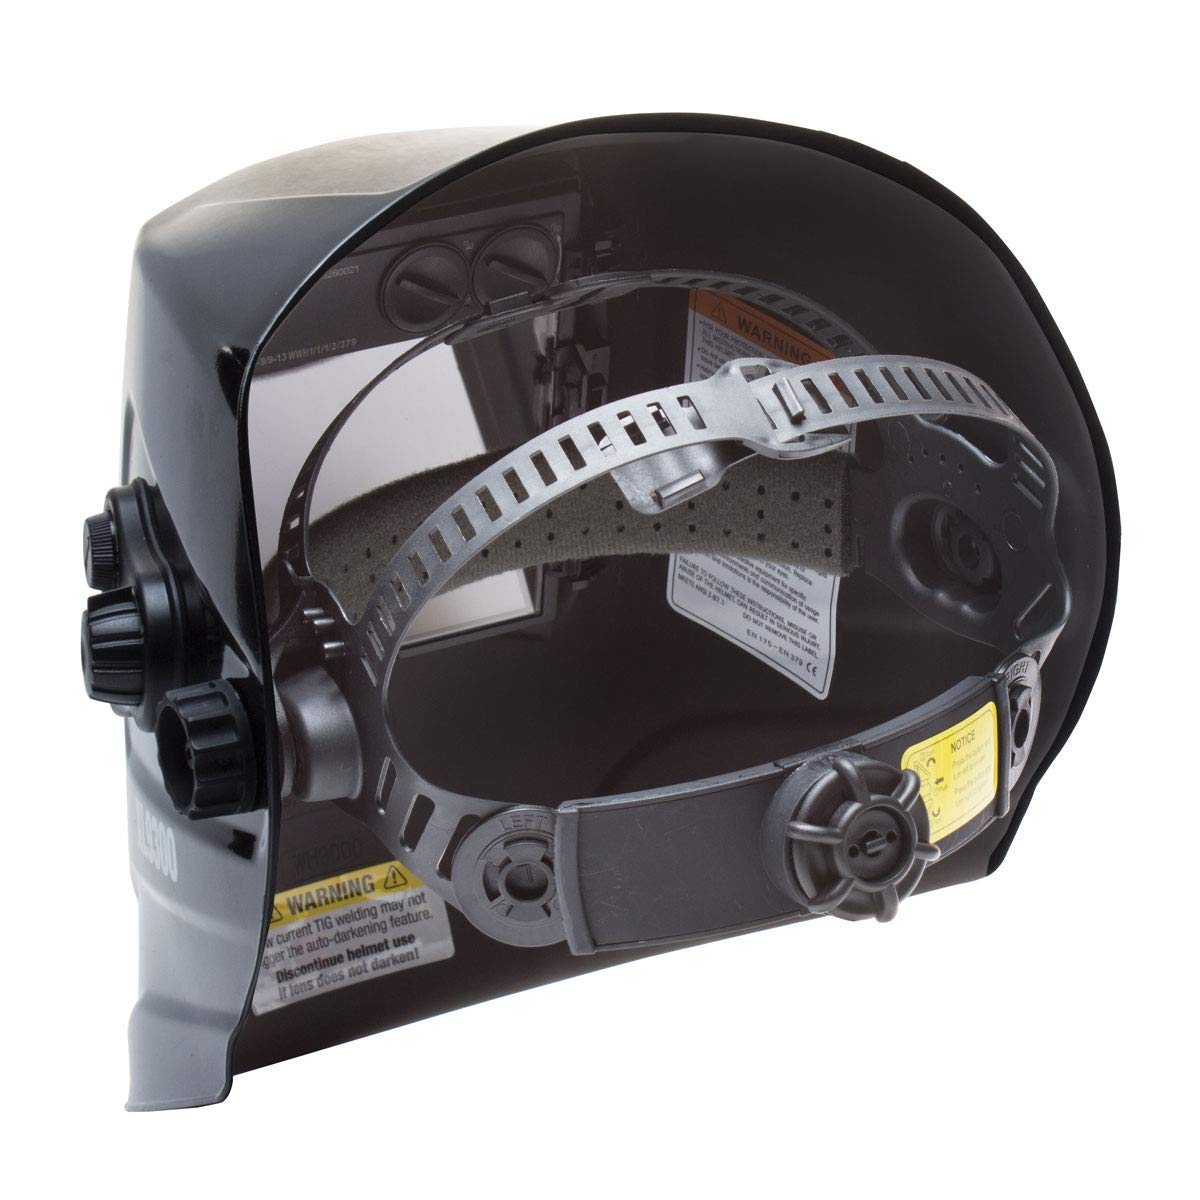 Eastwood Xl View Auto Darkening Welding Helmet Mask Kit Adjustable Headband Comfortable - Xl9300 by Eastwood (Image #6)